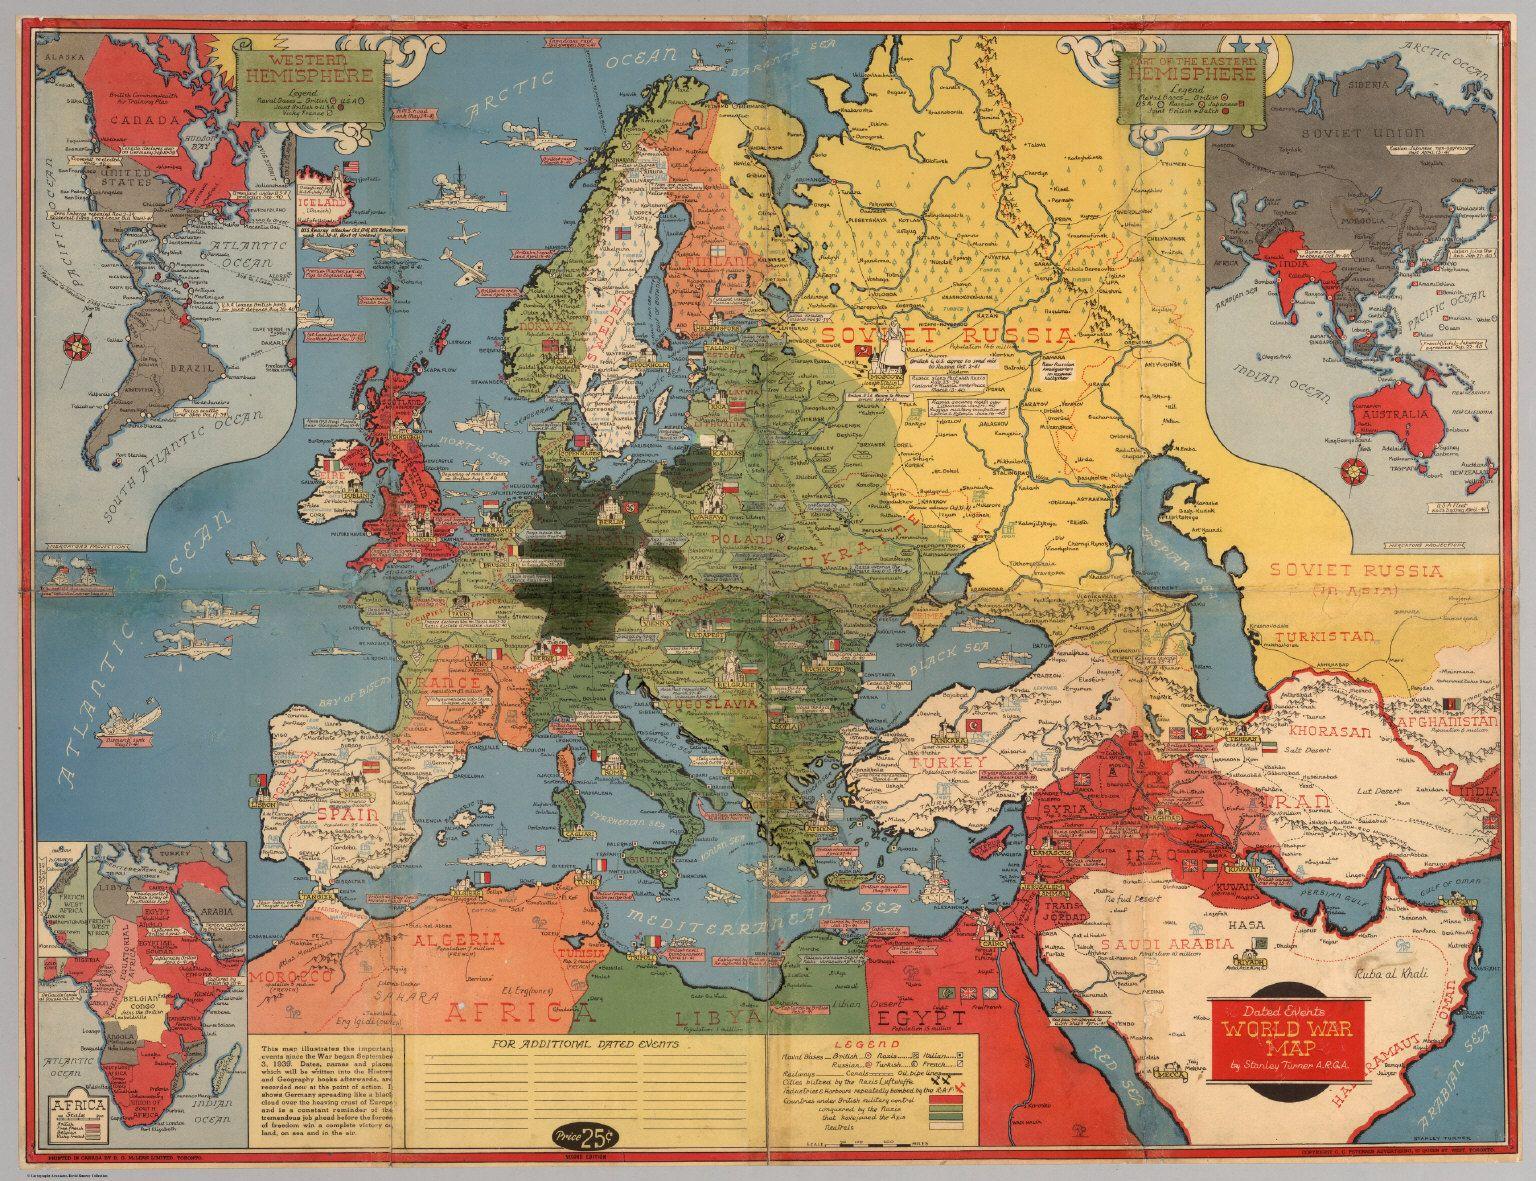 WW2 Maps Art History Europe World War 2 Map Print War Maps Canvas Art Framed Wall Prints wwii Map Poster Poster Print